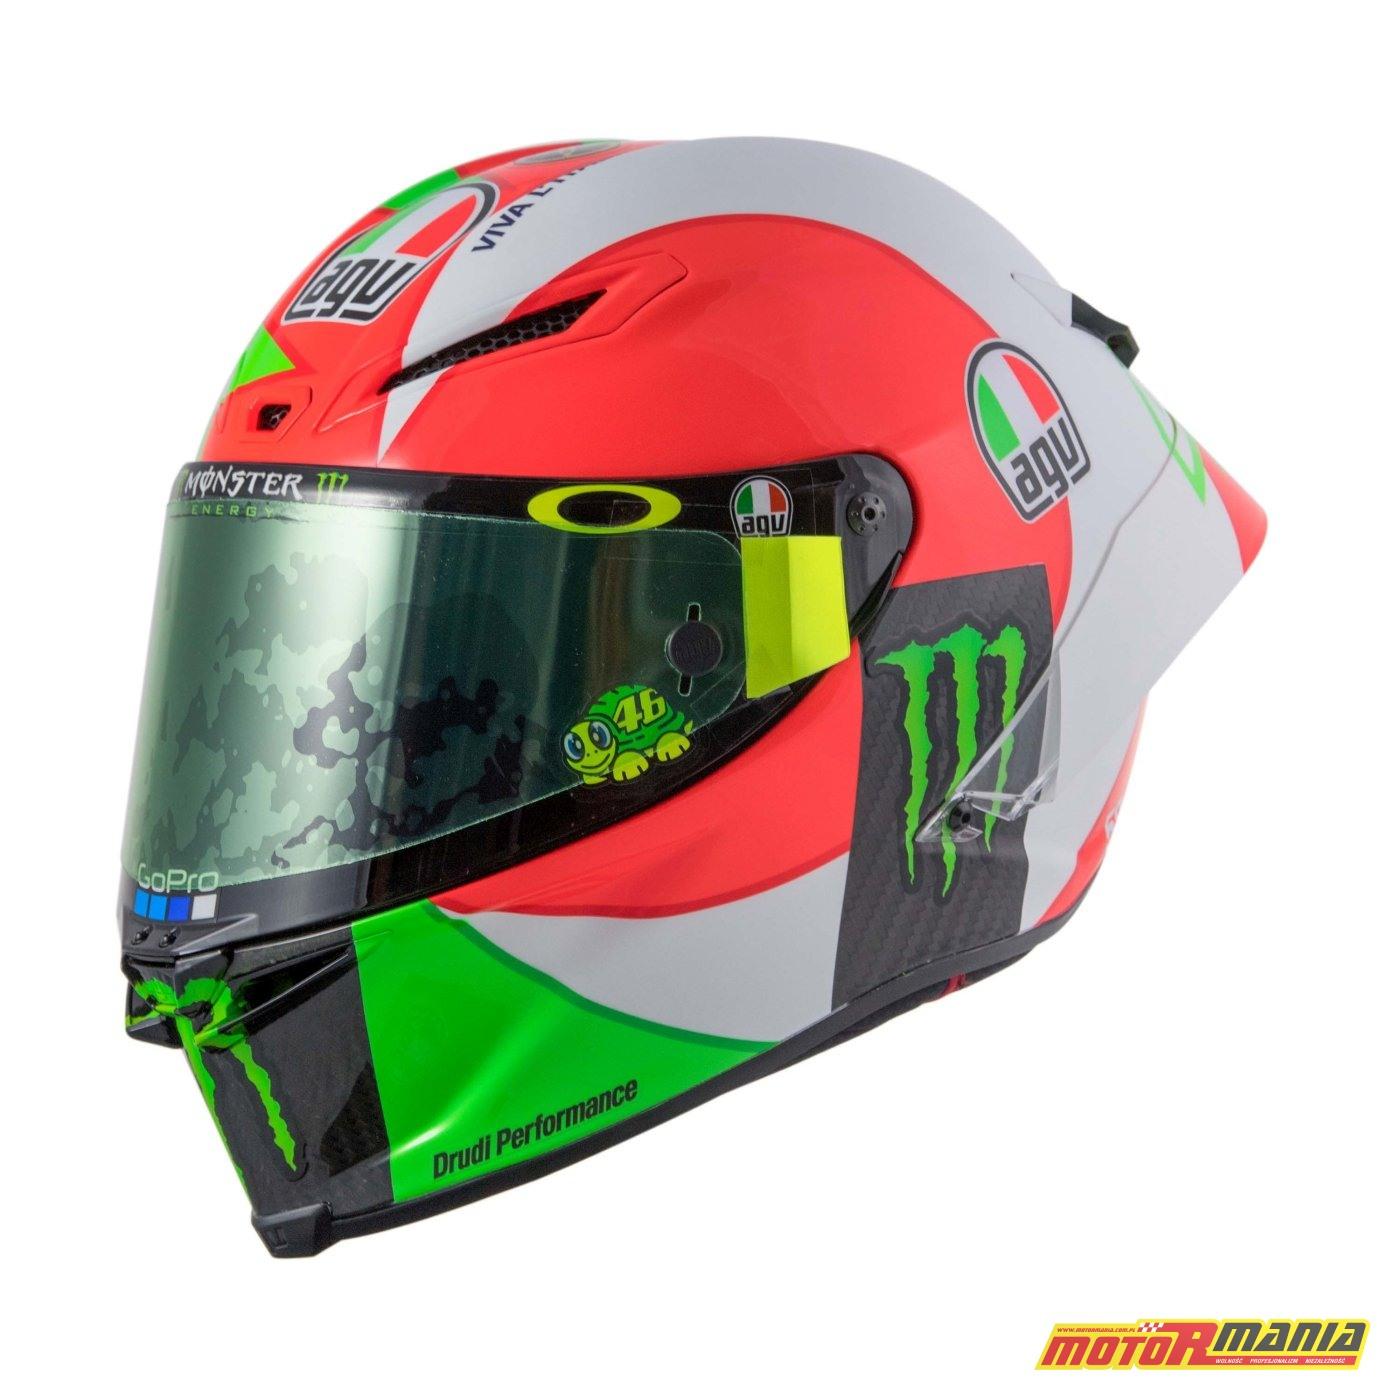 AGV Pista GP R Mugello 2018 kask Valentino Rossiego MotoGP (7)